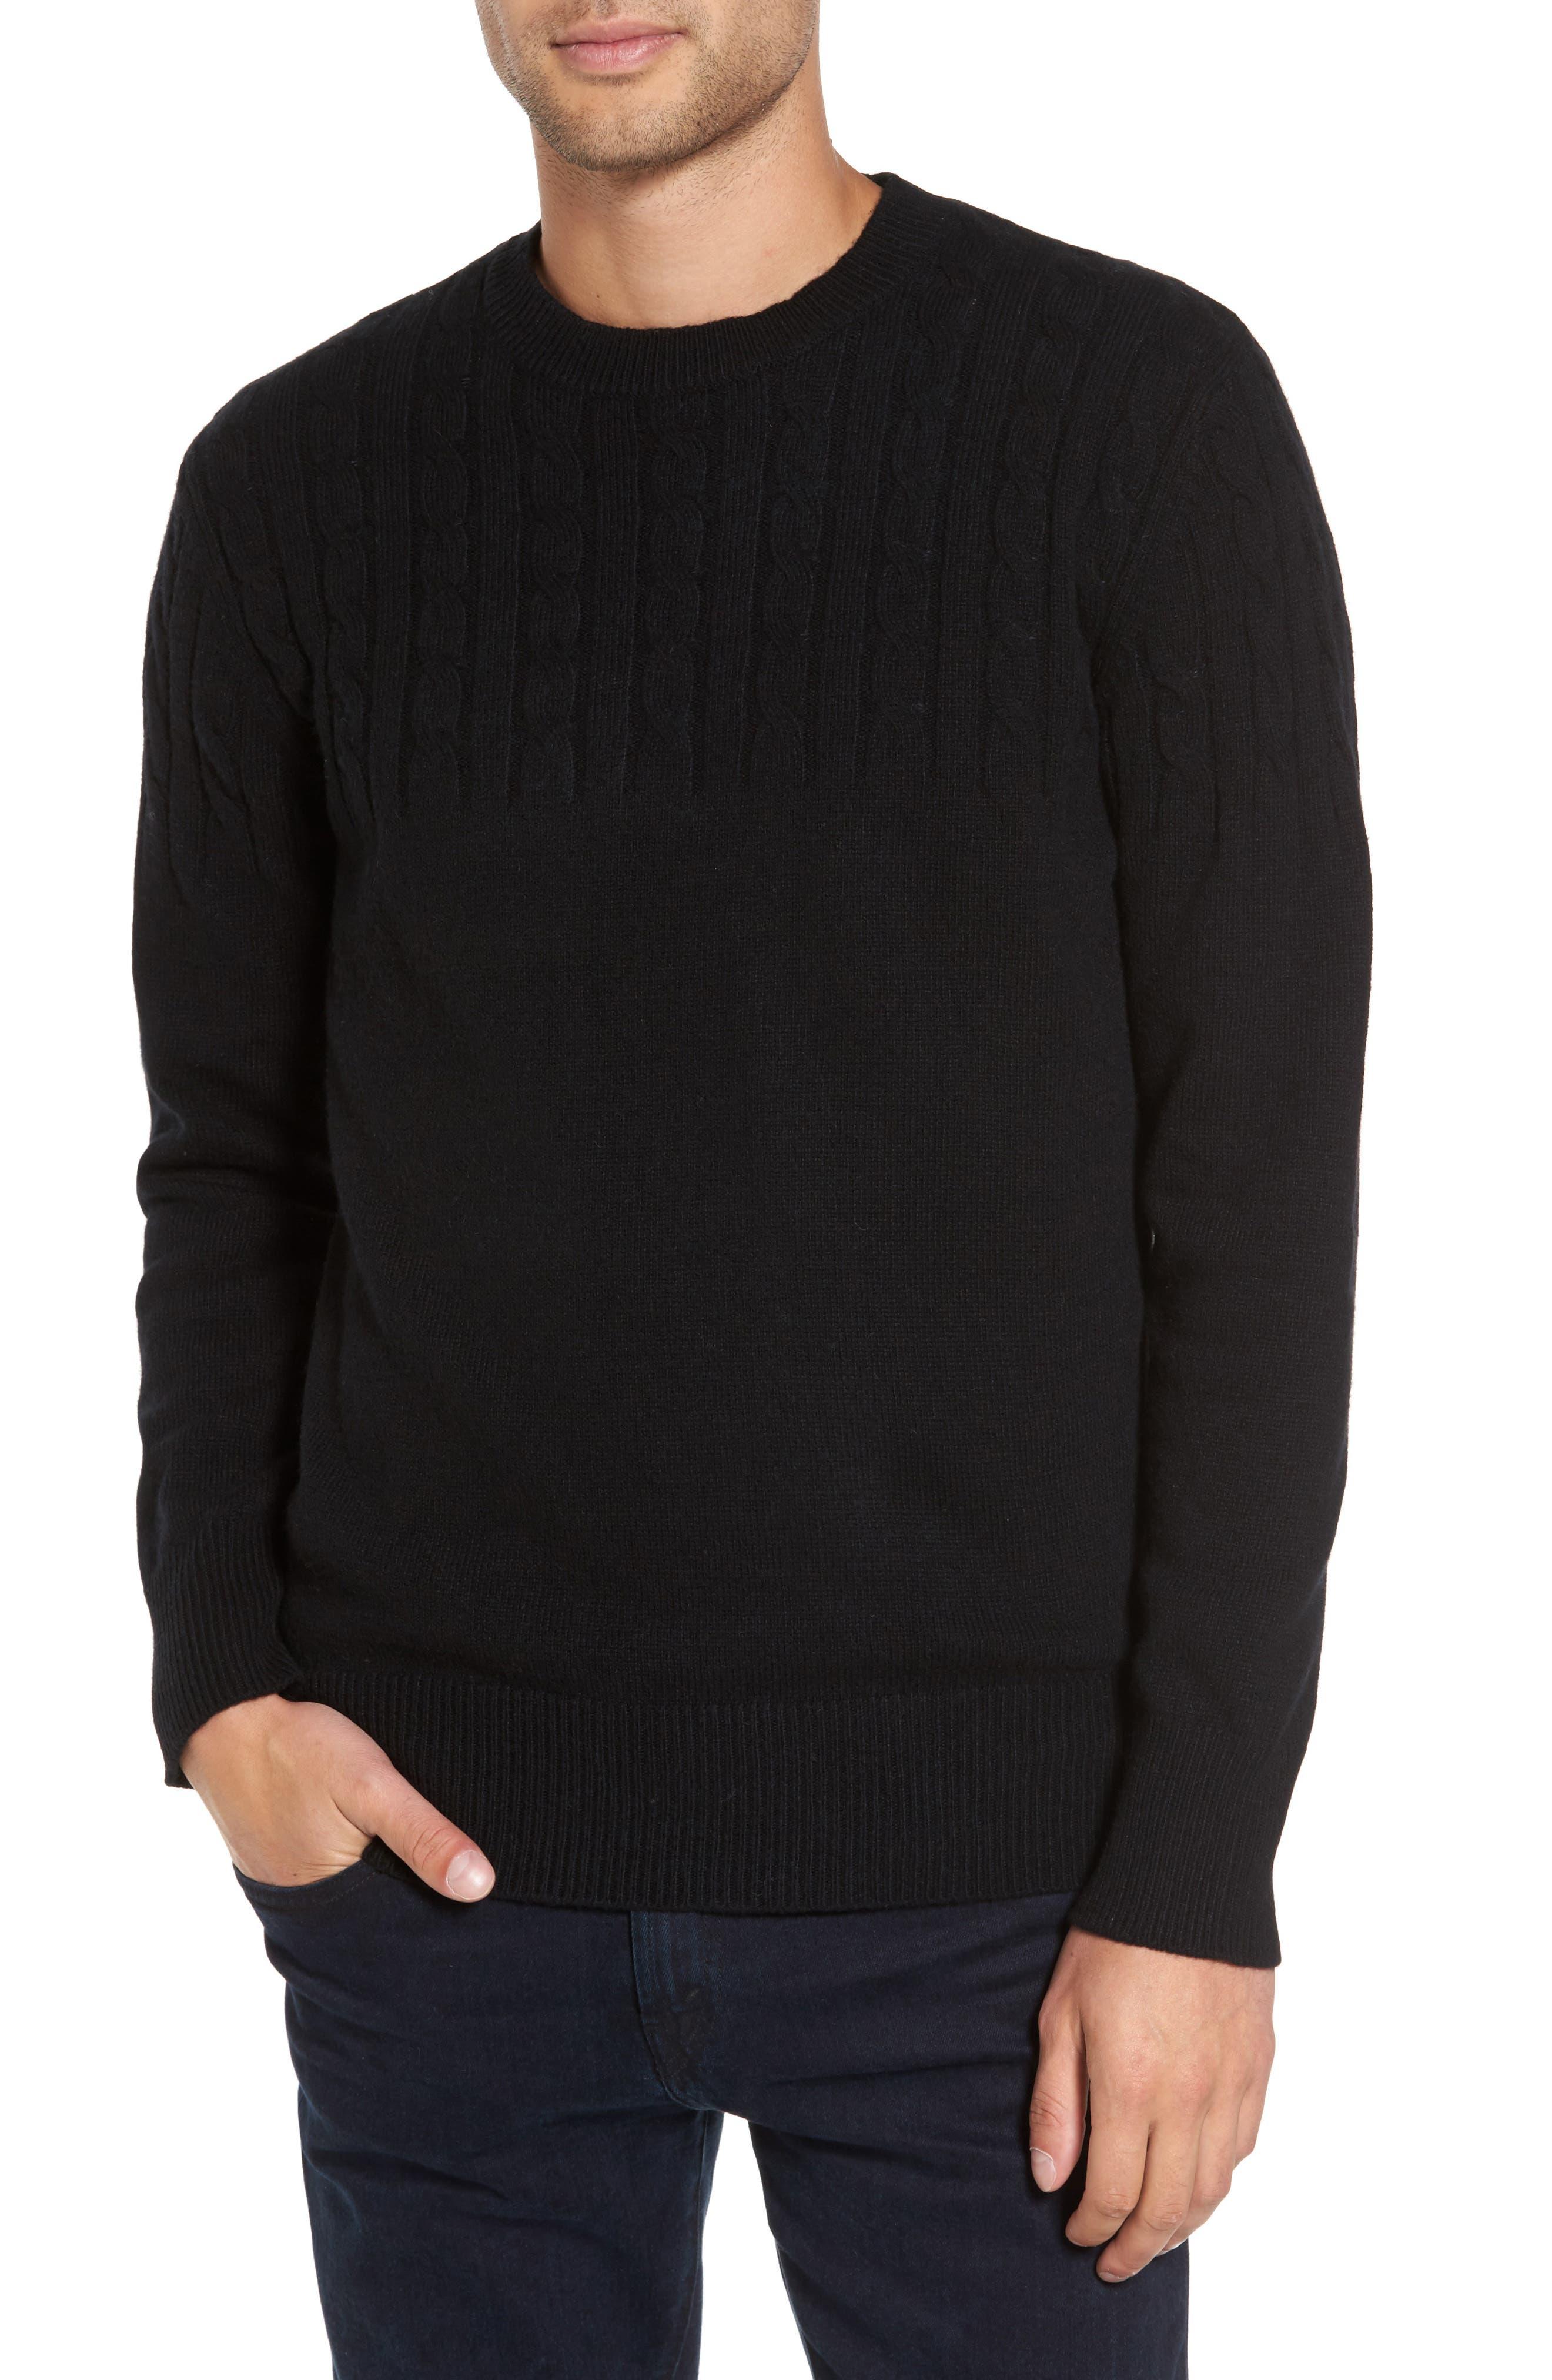 Main Image - Slate & Stone Wool Cable Knit Sweater